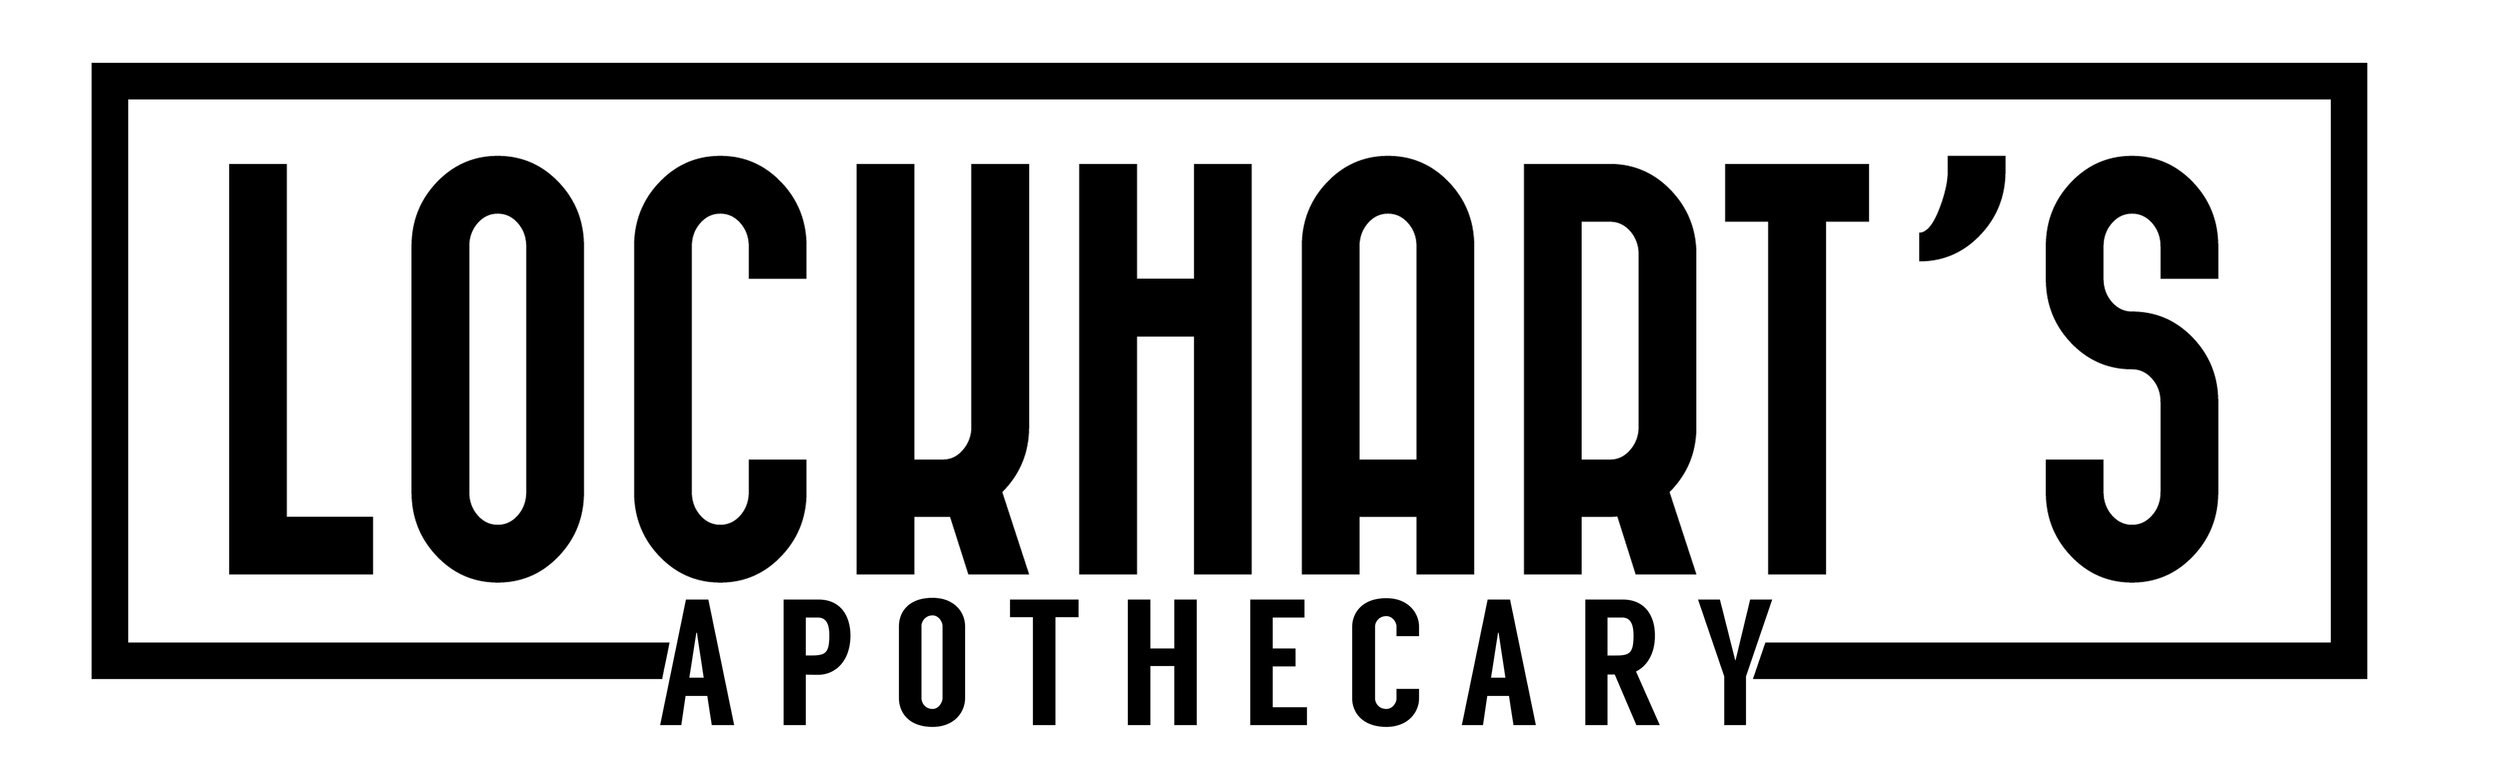 apothecary logo invert.jpg